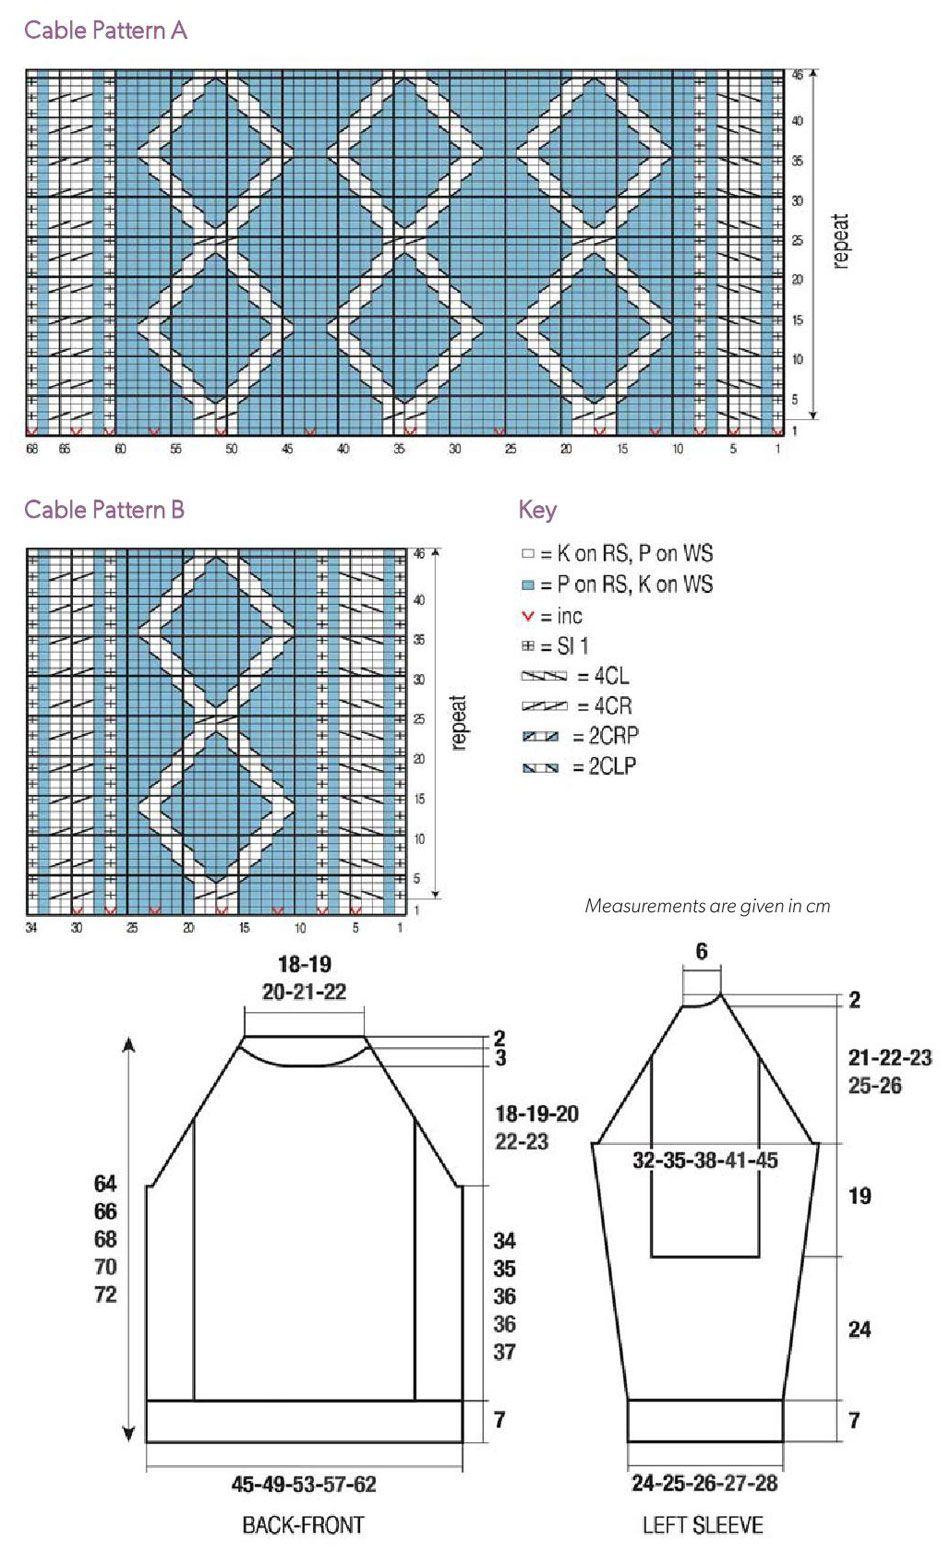 Men\'s Cable Sweater Knitting Pattern Free | любимому мужу ...